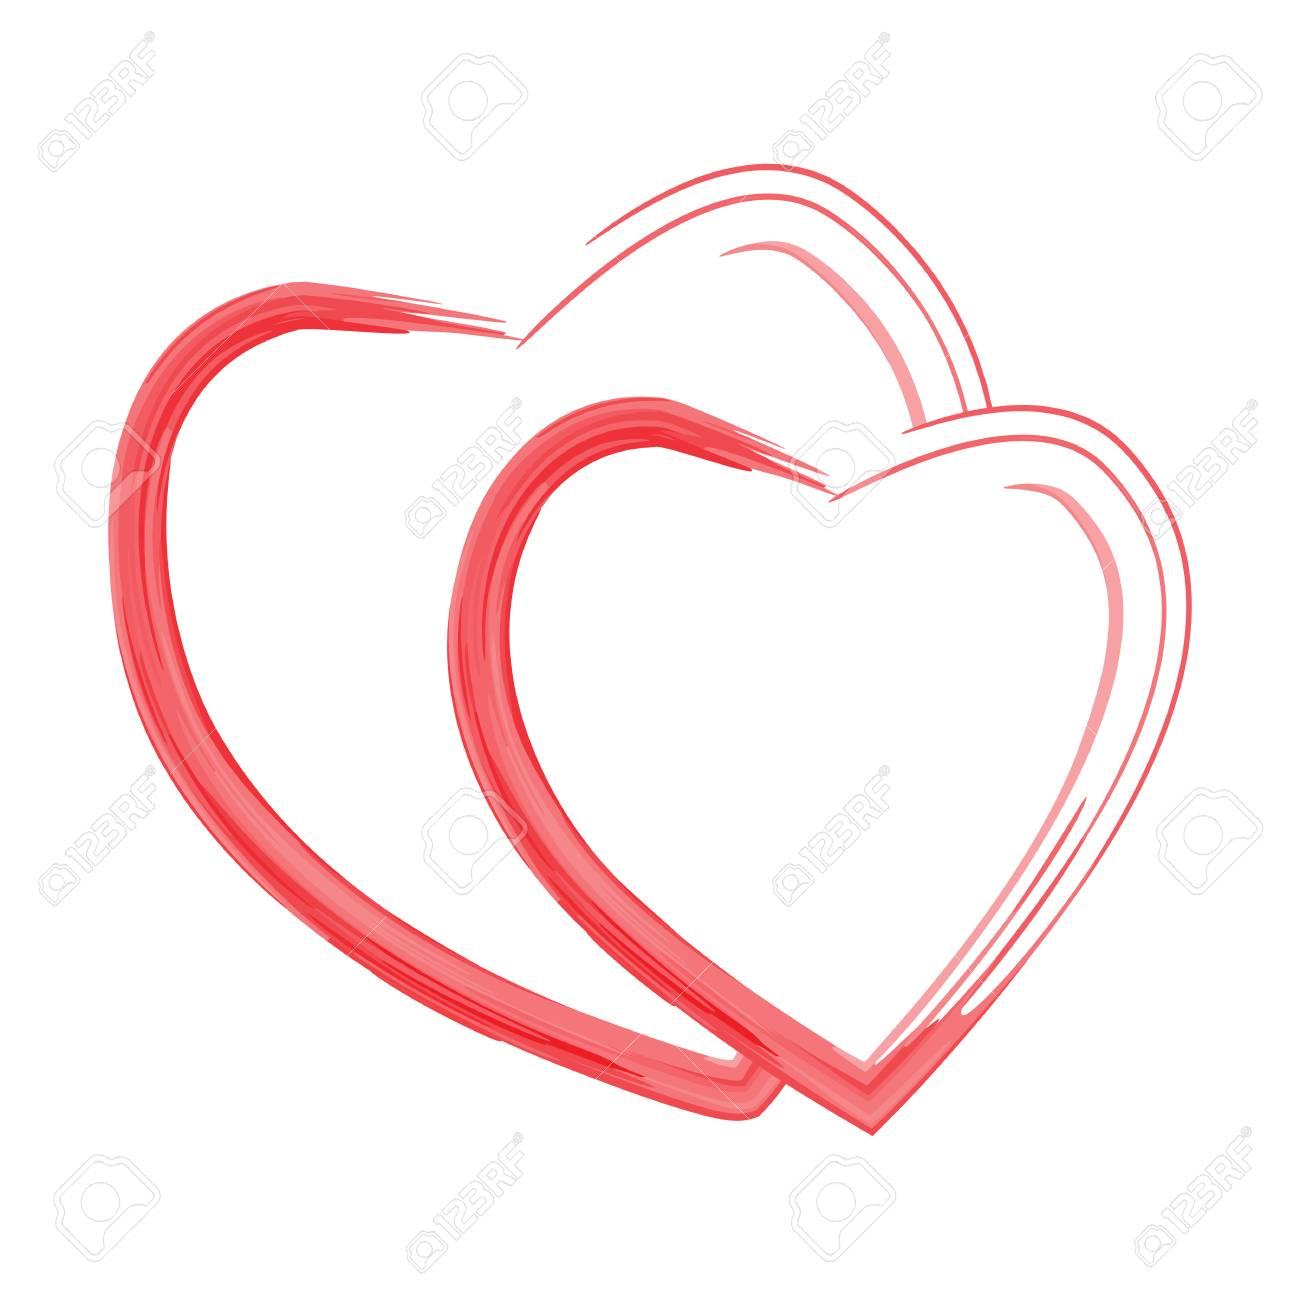 Heart shape design for love symbols valentines day royalty free heart shape design for love symbols valentines day stock vector 71227036 buycottarizona Gallery